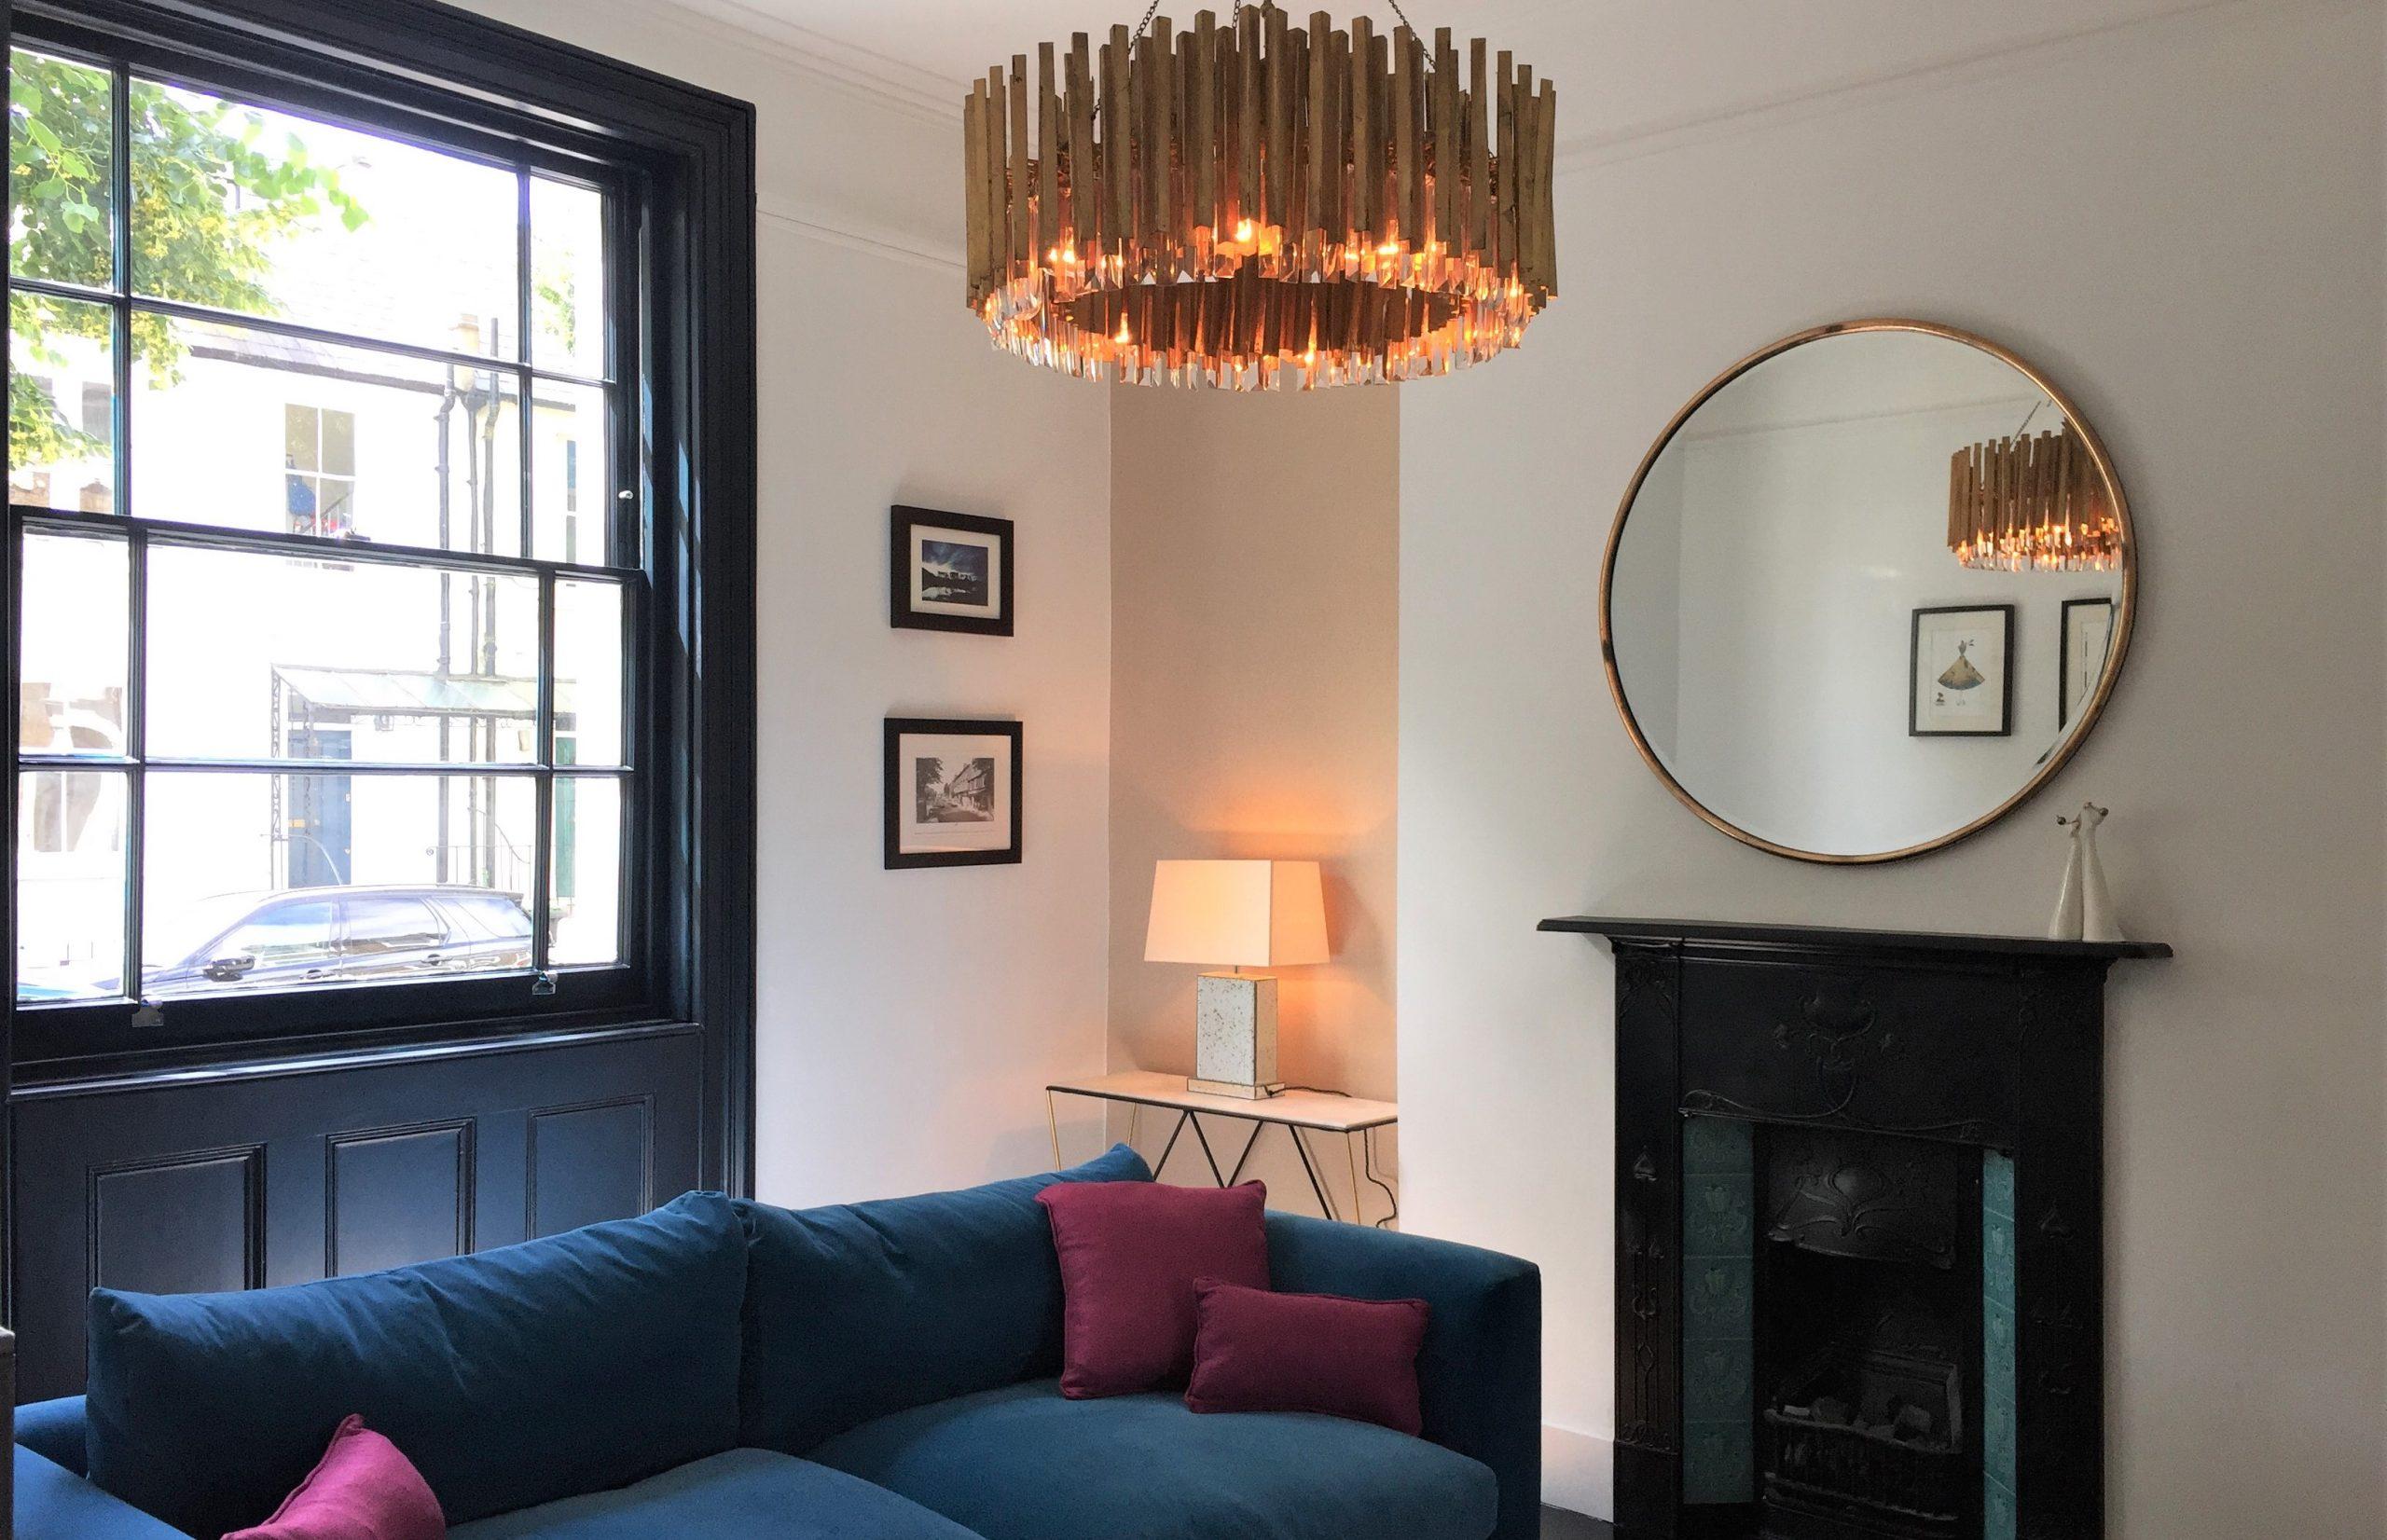 Design-Penguin-Interior-Design-Living Room - period property Eton Grove